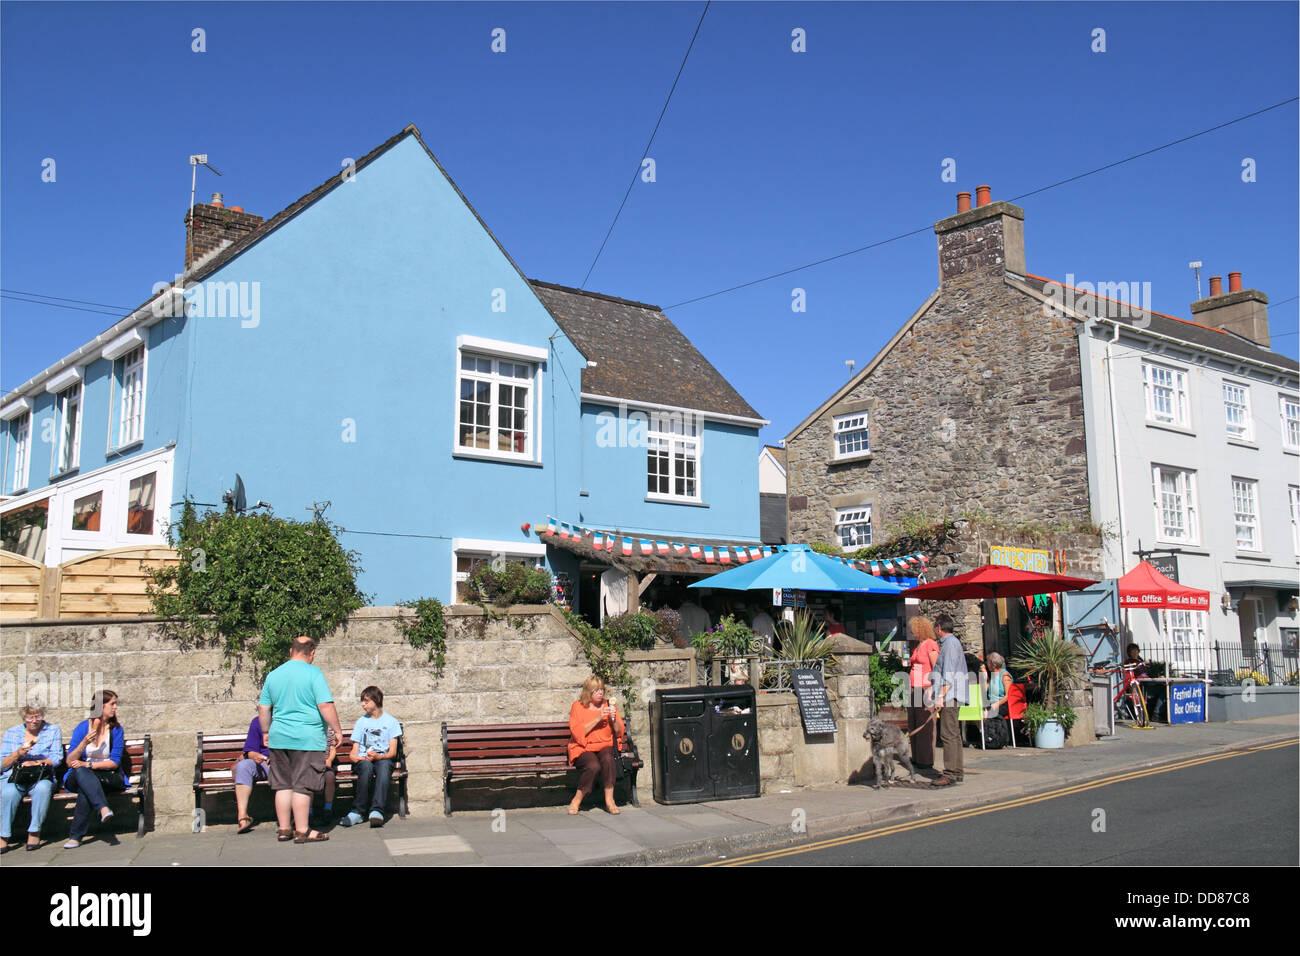 Gianni's Ice Cream shop, High Street, St Davids, Pembrokeshire, Wales, United Kingdom, UK, Europe - Stock Image